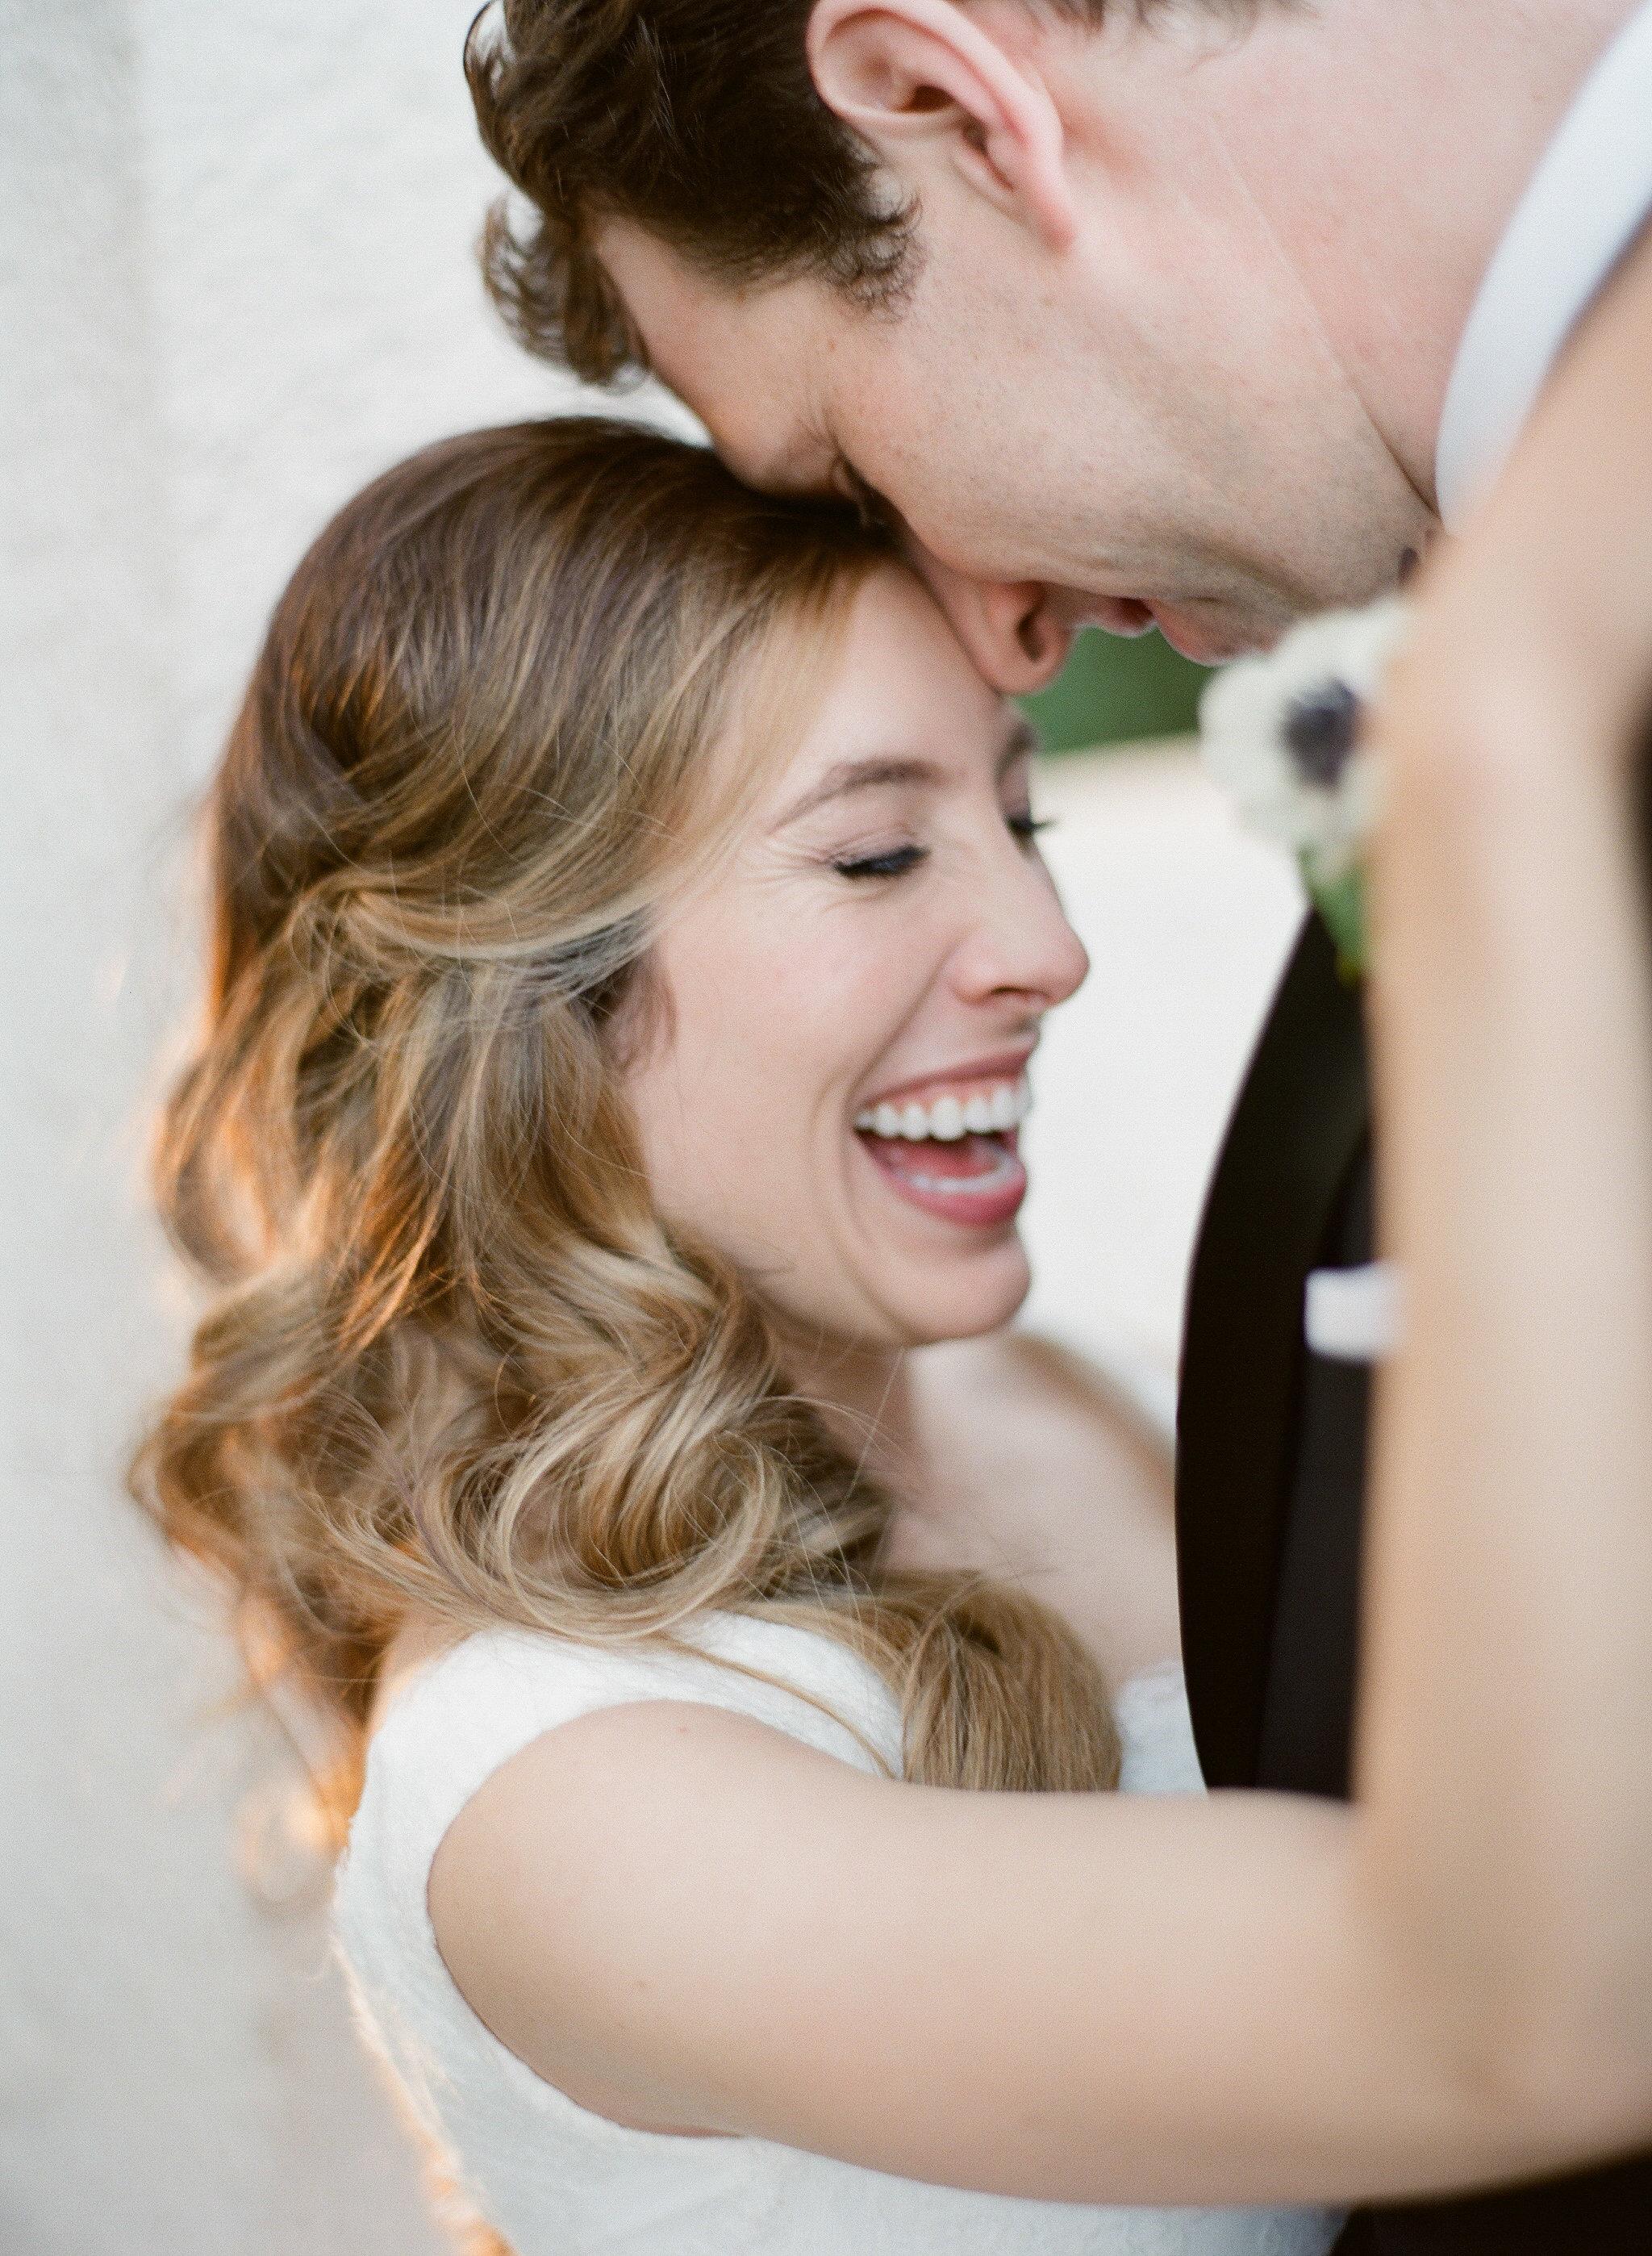 LAGUNA-GLORIA-WEDDING-AUSTIN-MATTHEW-MOORE-PHOTOGRAPHY-00371 copy.jpg